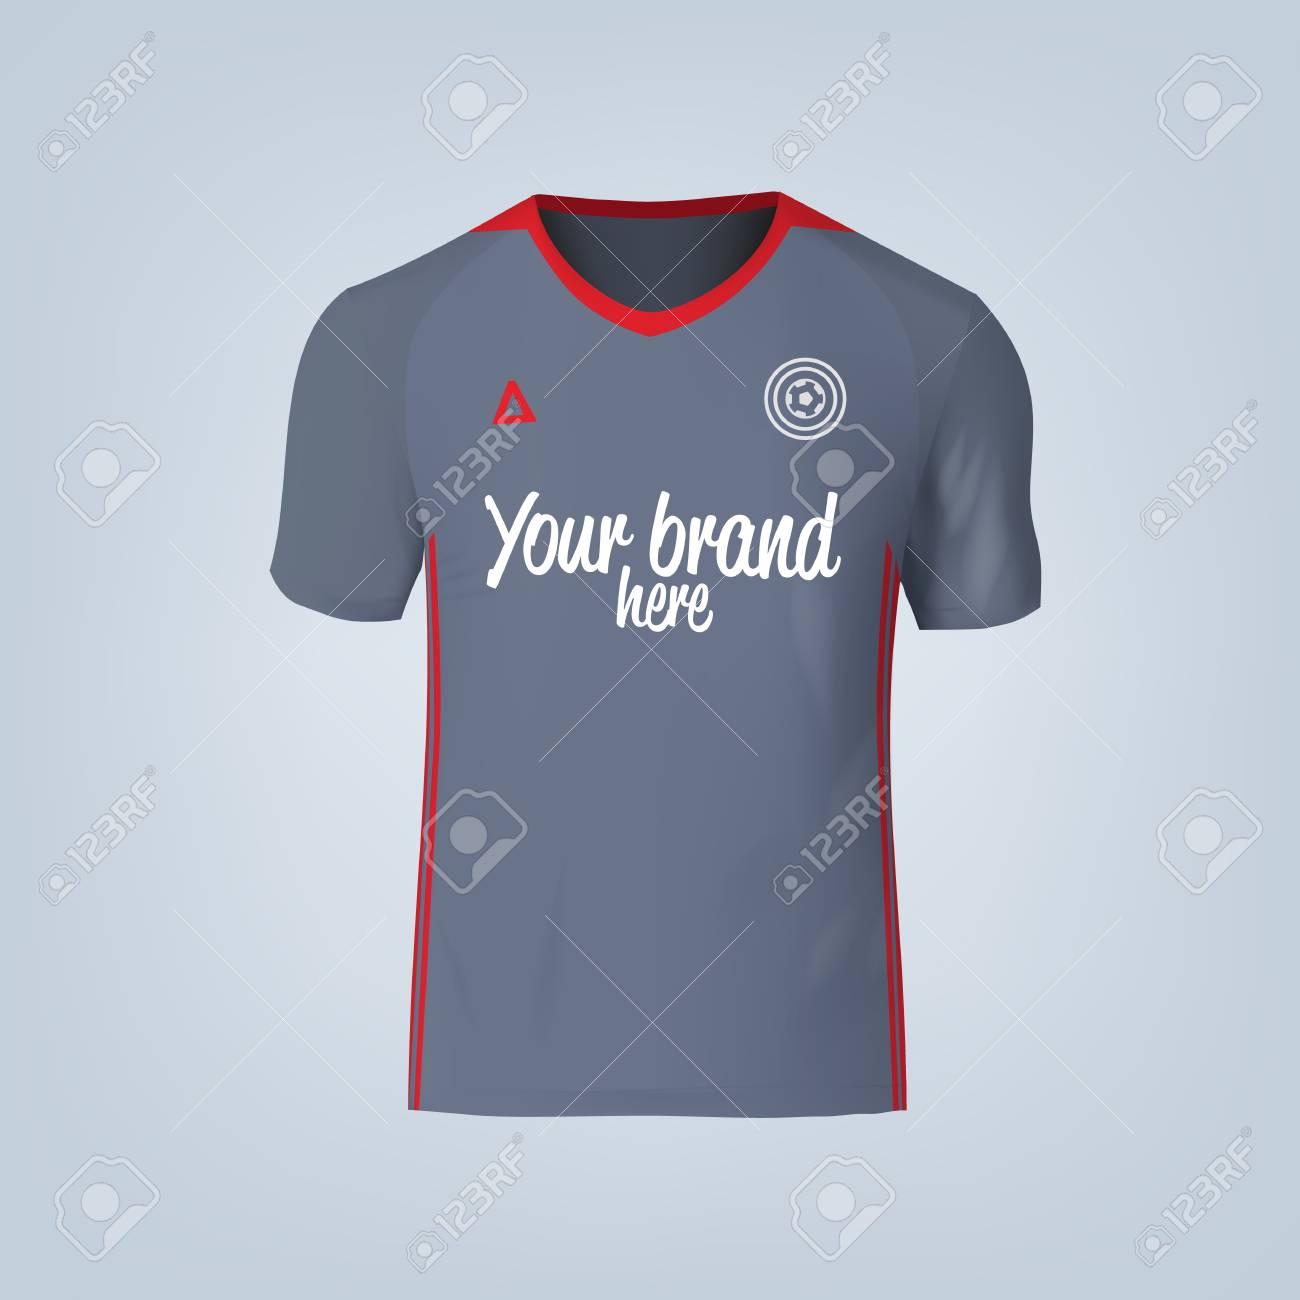 Vector illustration of football t-shirt template. - 84013212